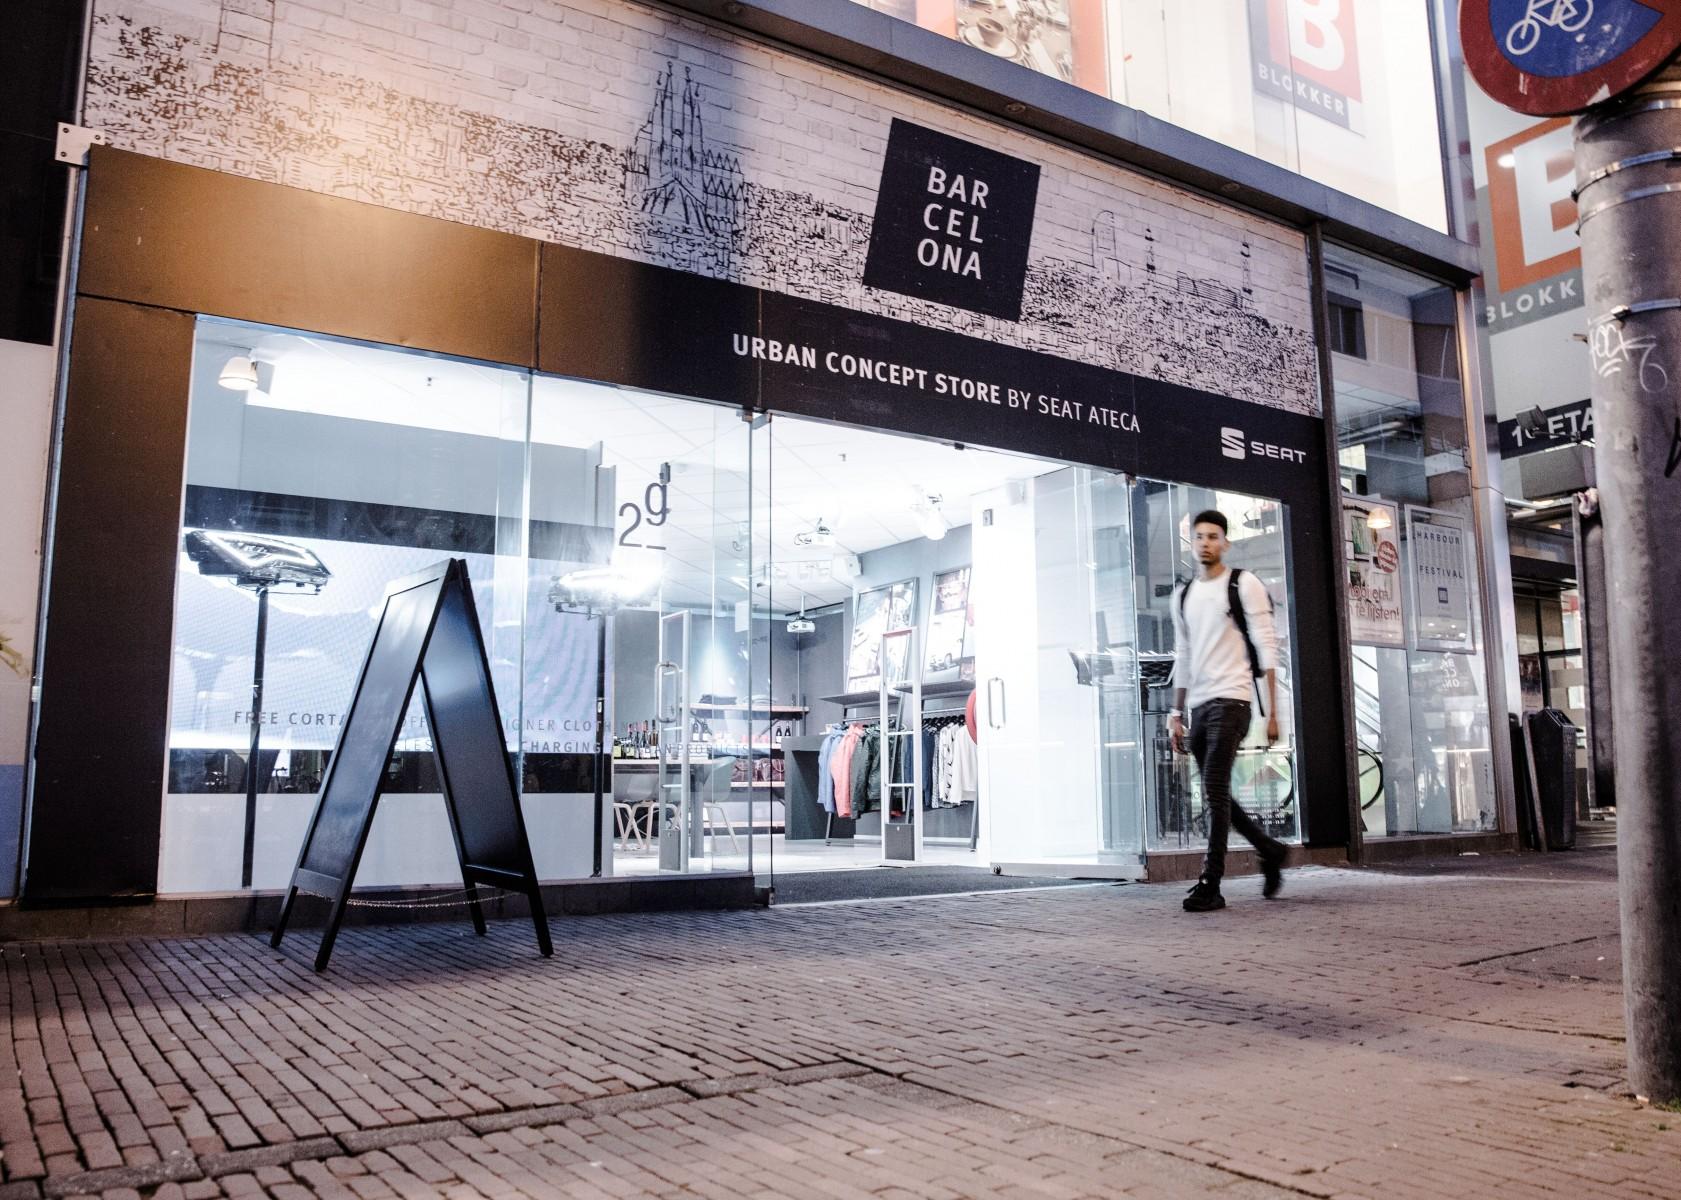 barcelona in utrecht urban concept store by seat ateca. Black Bedroom Furniture Sets. Home Design Ideas